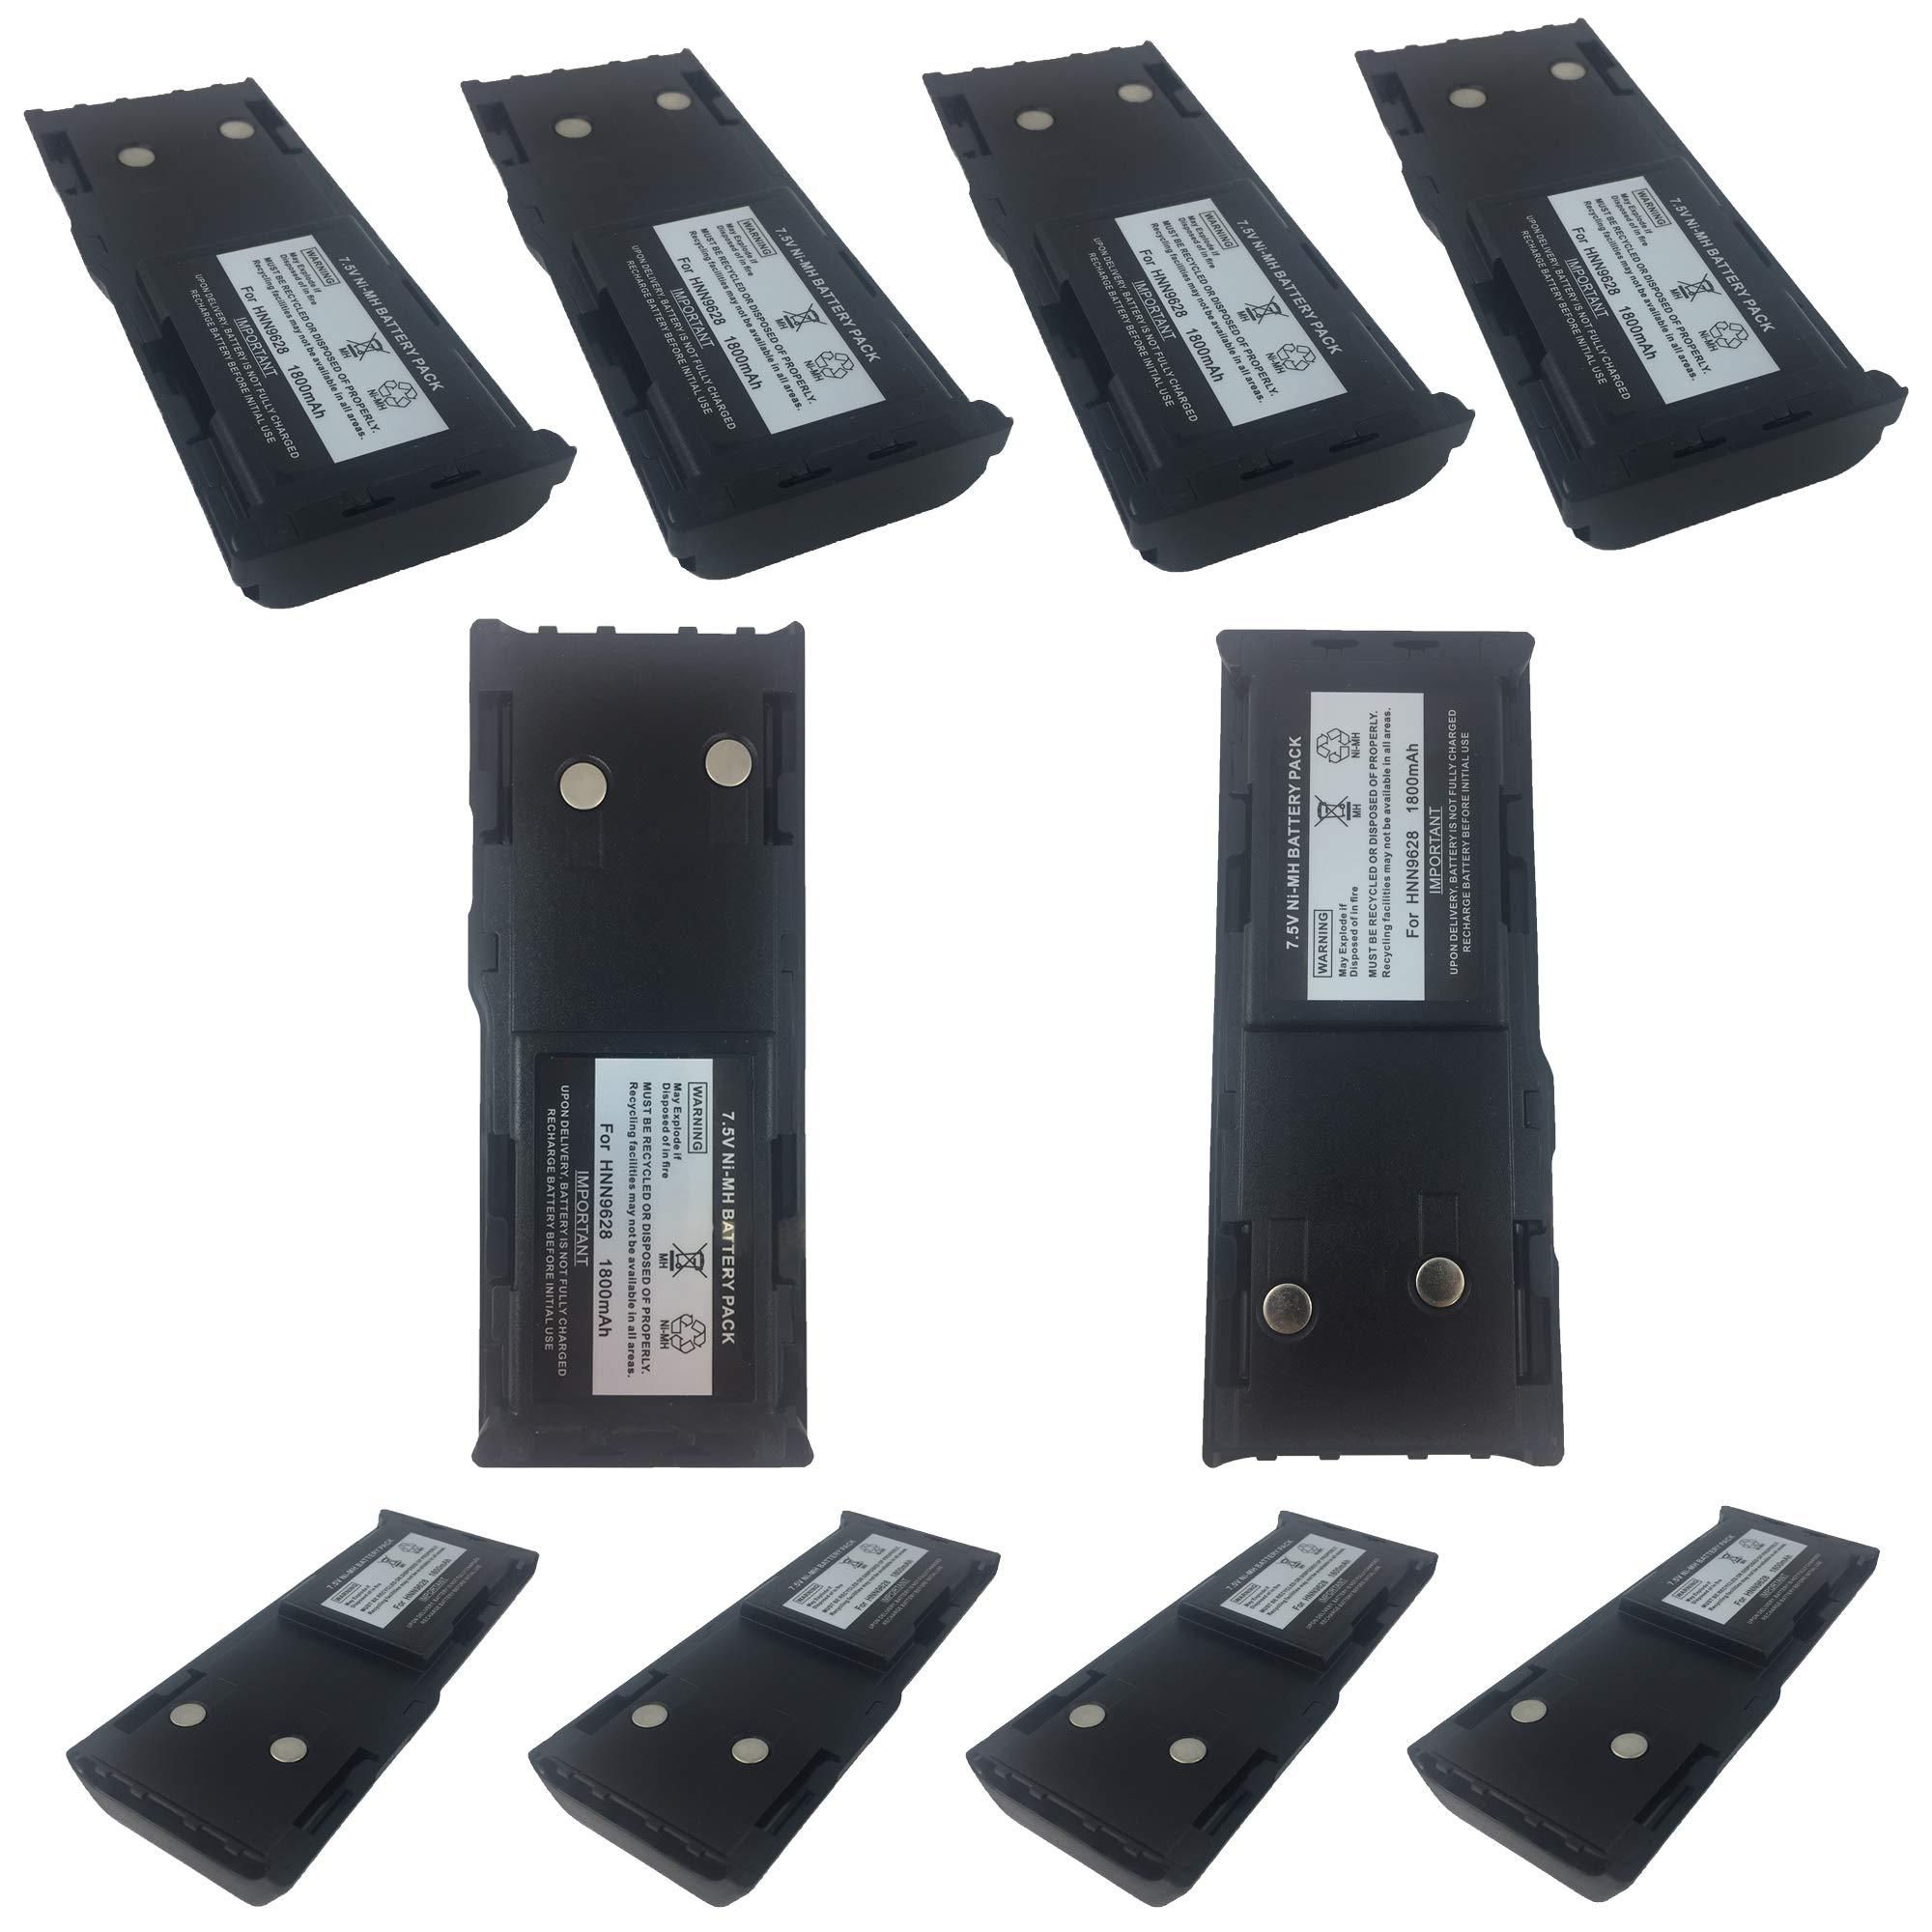 ProMaxPower 1800mAh 7.5V HNN9628 Battery for Motorola GP88 GP600 GP300 GTX800 PTX600 MTX638 (10-Pack) by ProMaxPower